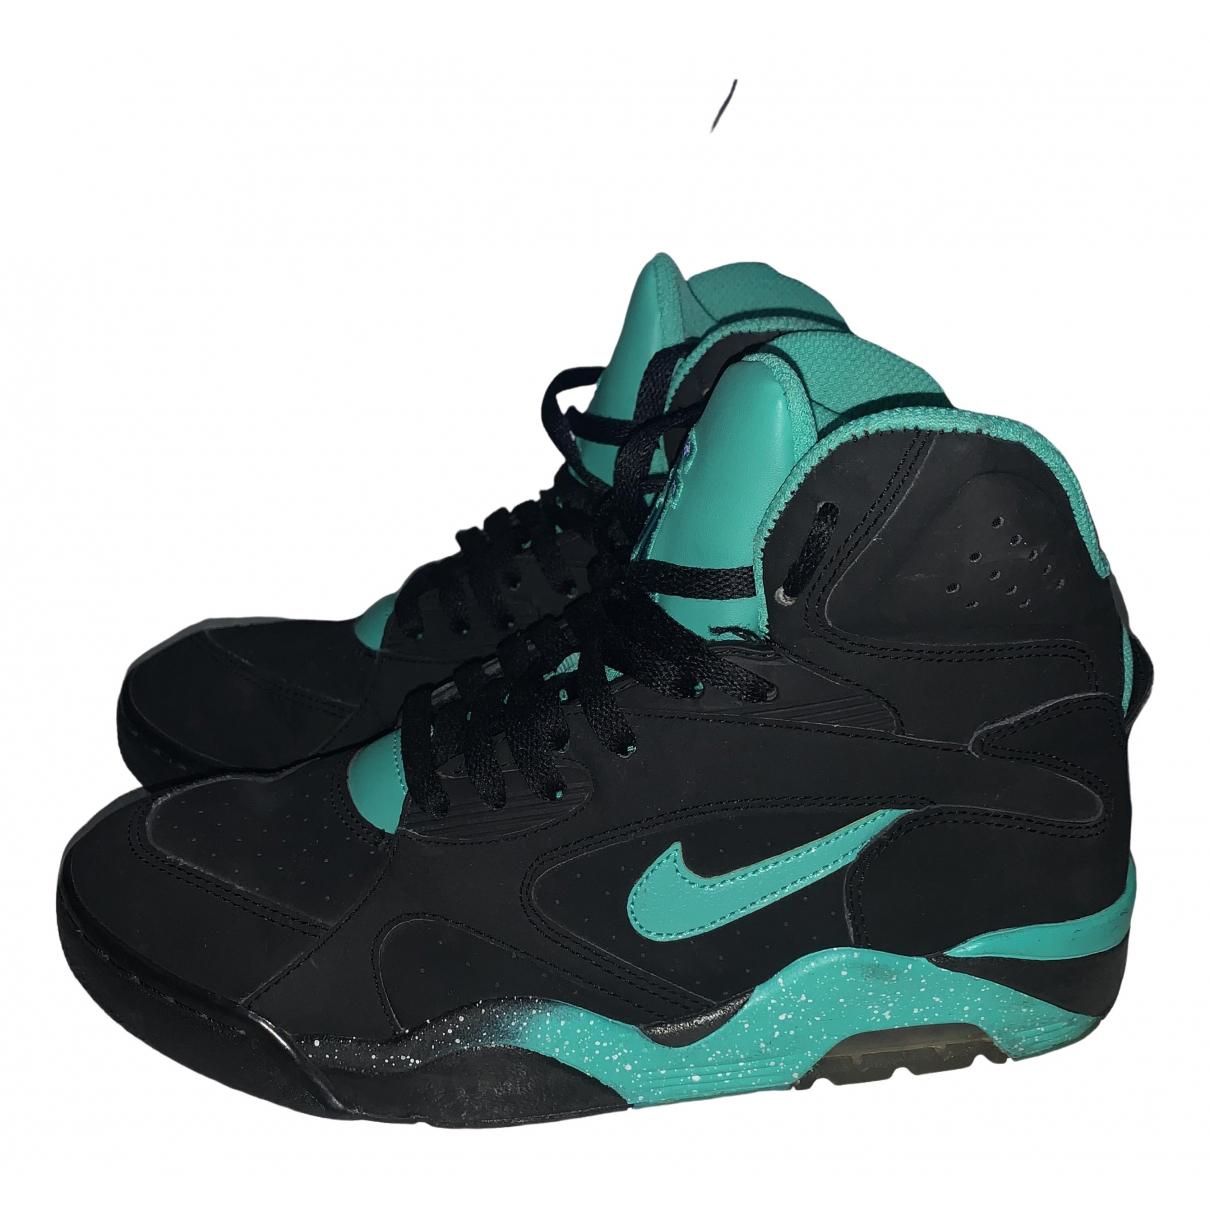 Nike \N Black Suede Trainers for Men 41 EU